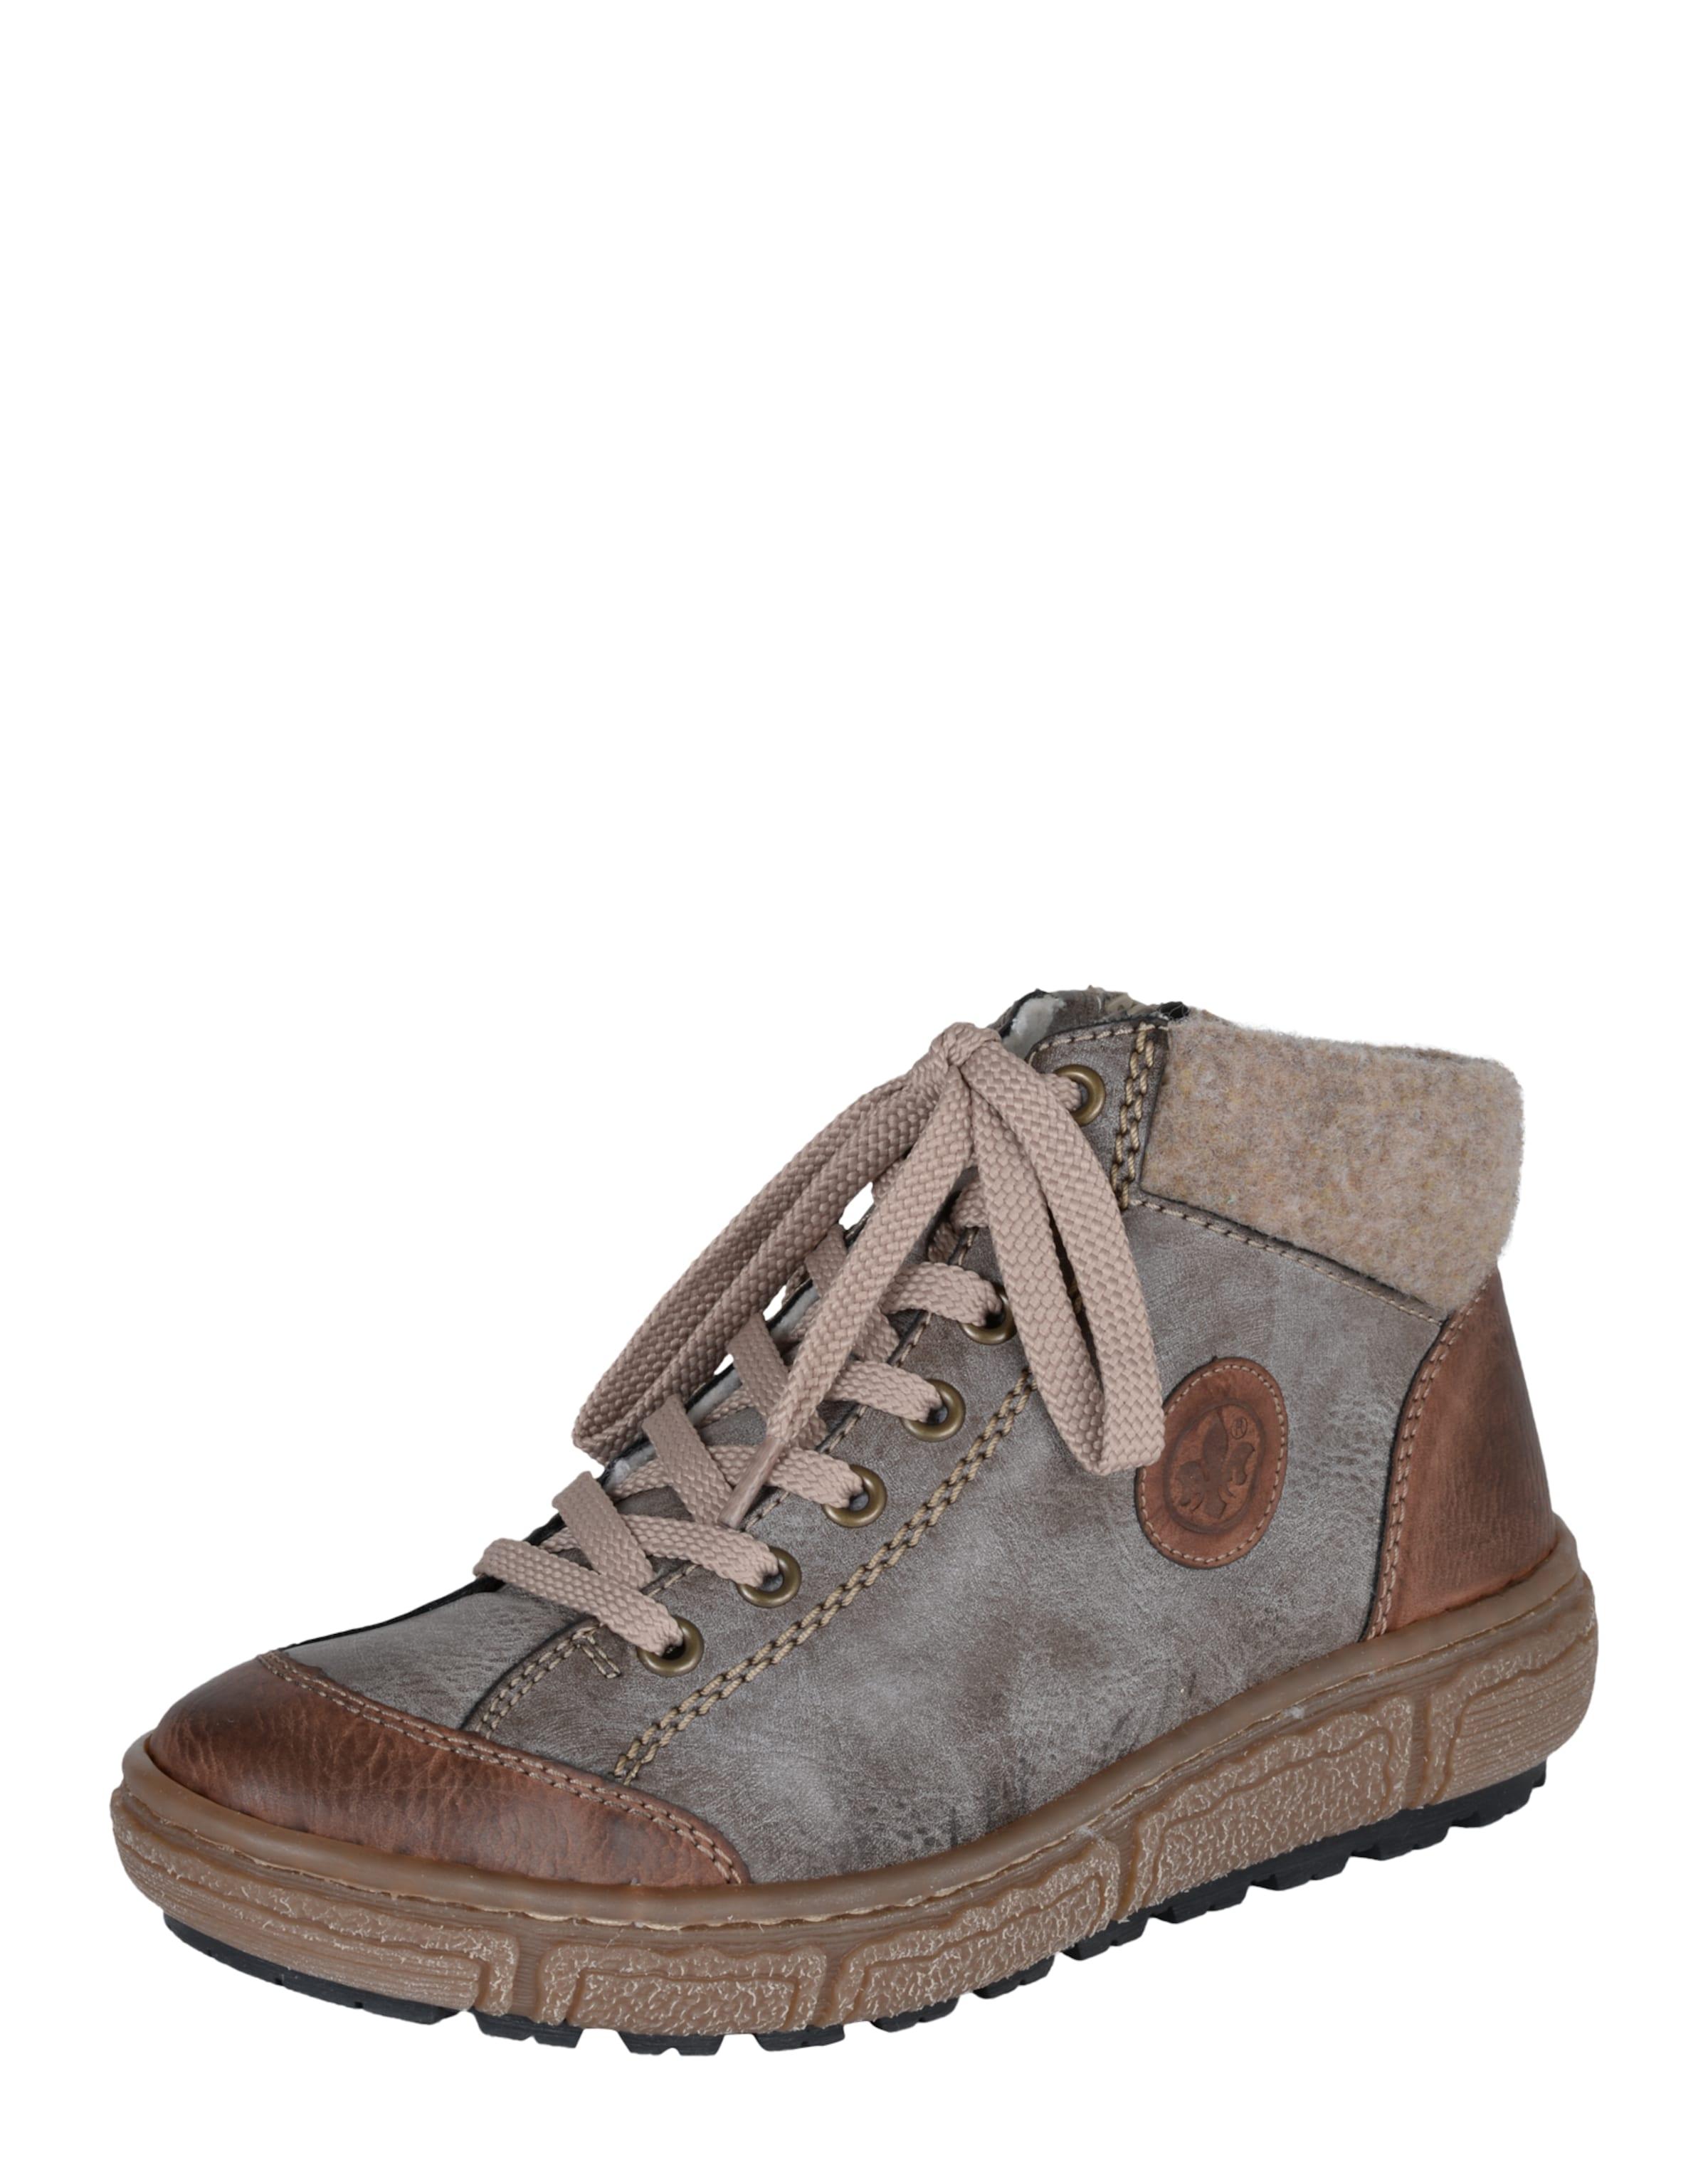 Rabatt Nicekicks Verkauf Von Top-Qualität RIEKER Sneaker mit Fleece-Fütterung HEQ0v04a